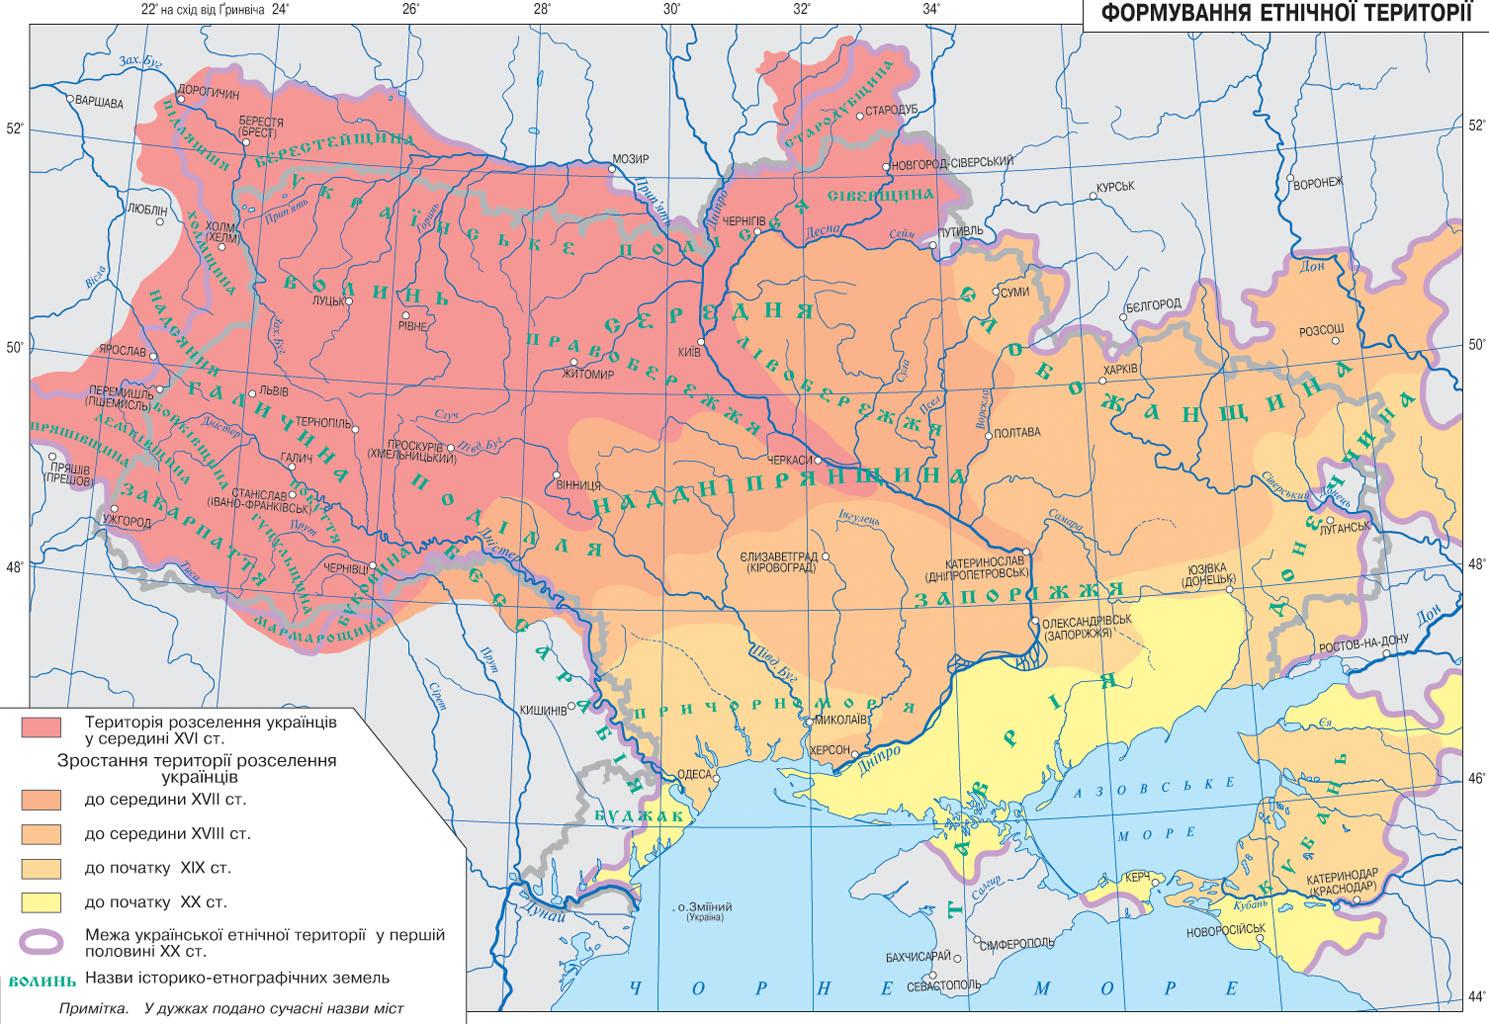 https://geomap.com.ua/images/g9a/Maps/6.jpg